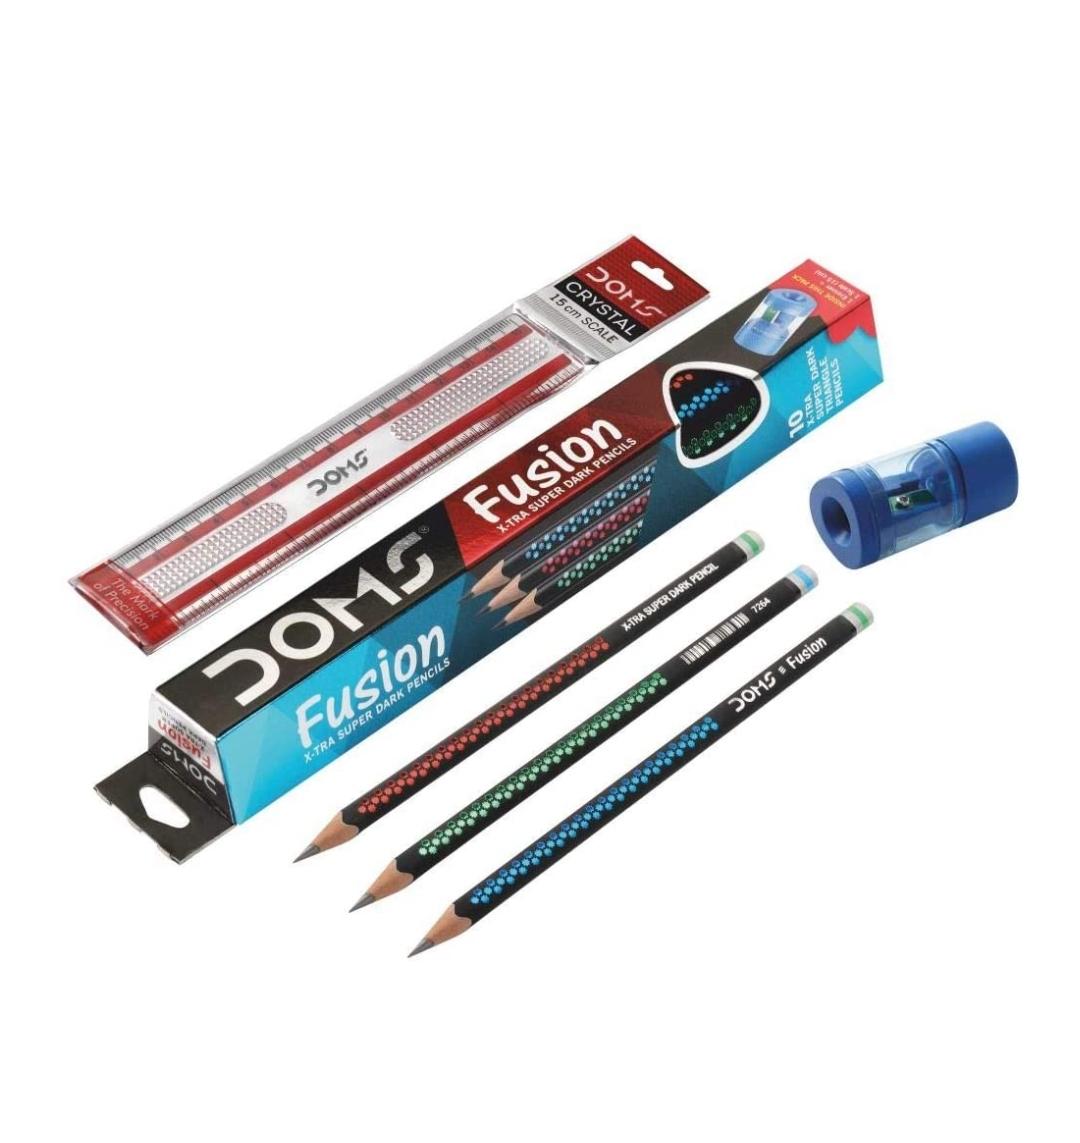 Doms Fusion Pencil Pack of 10 Pencils